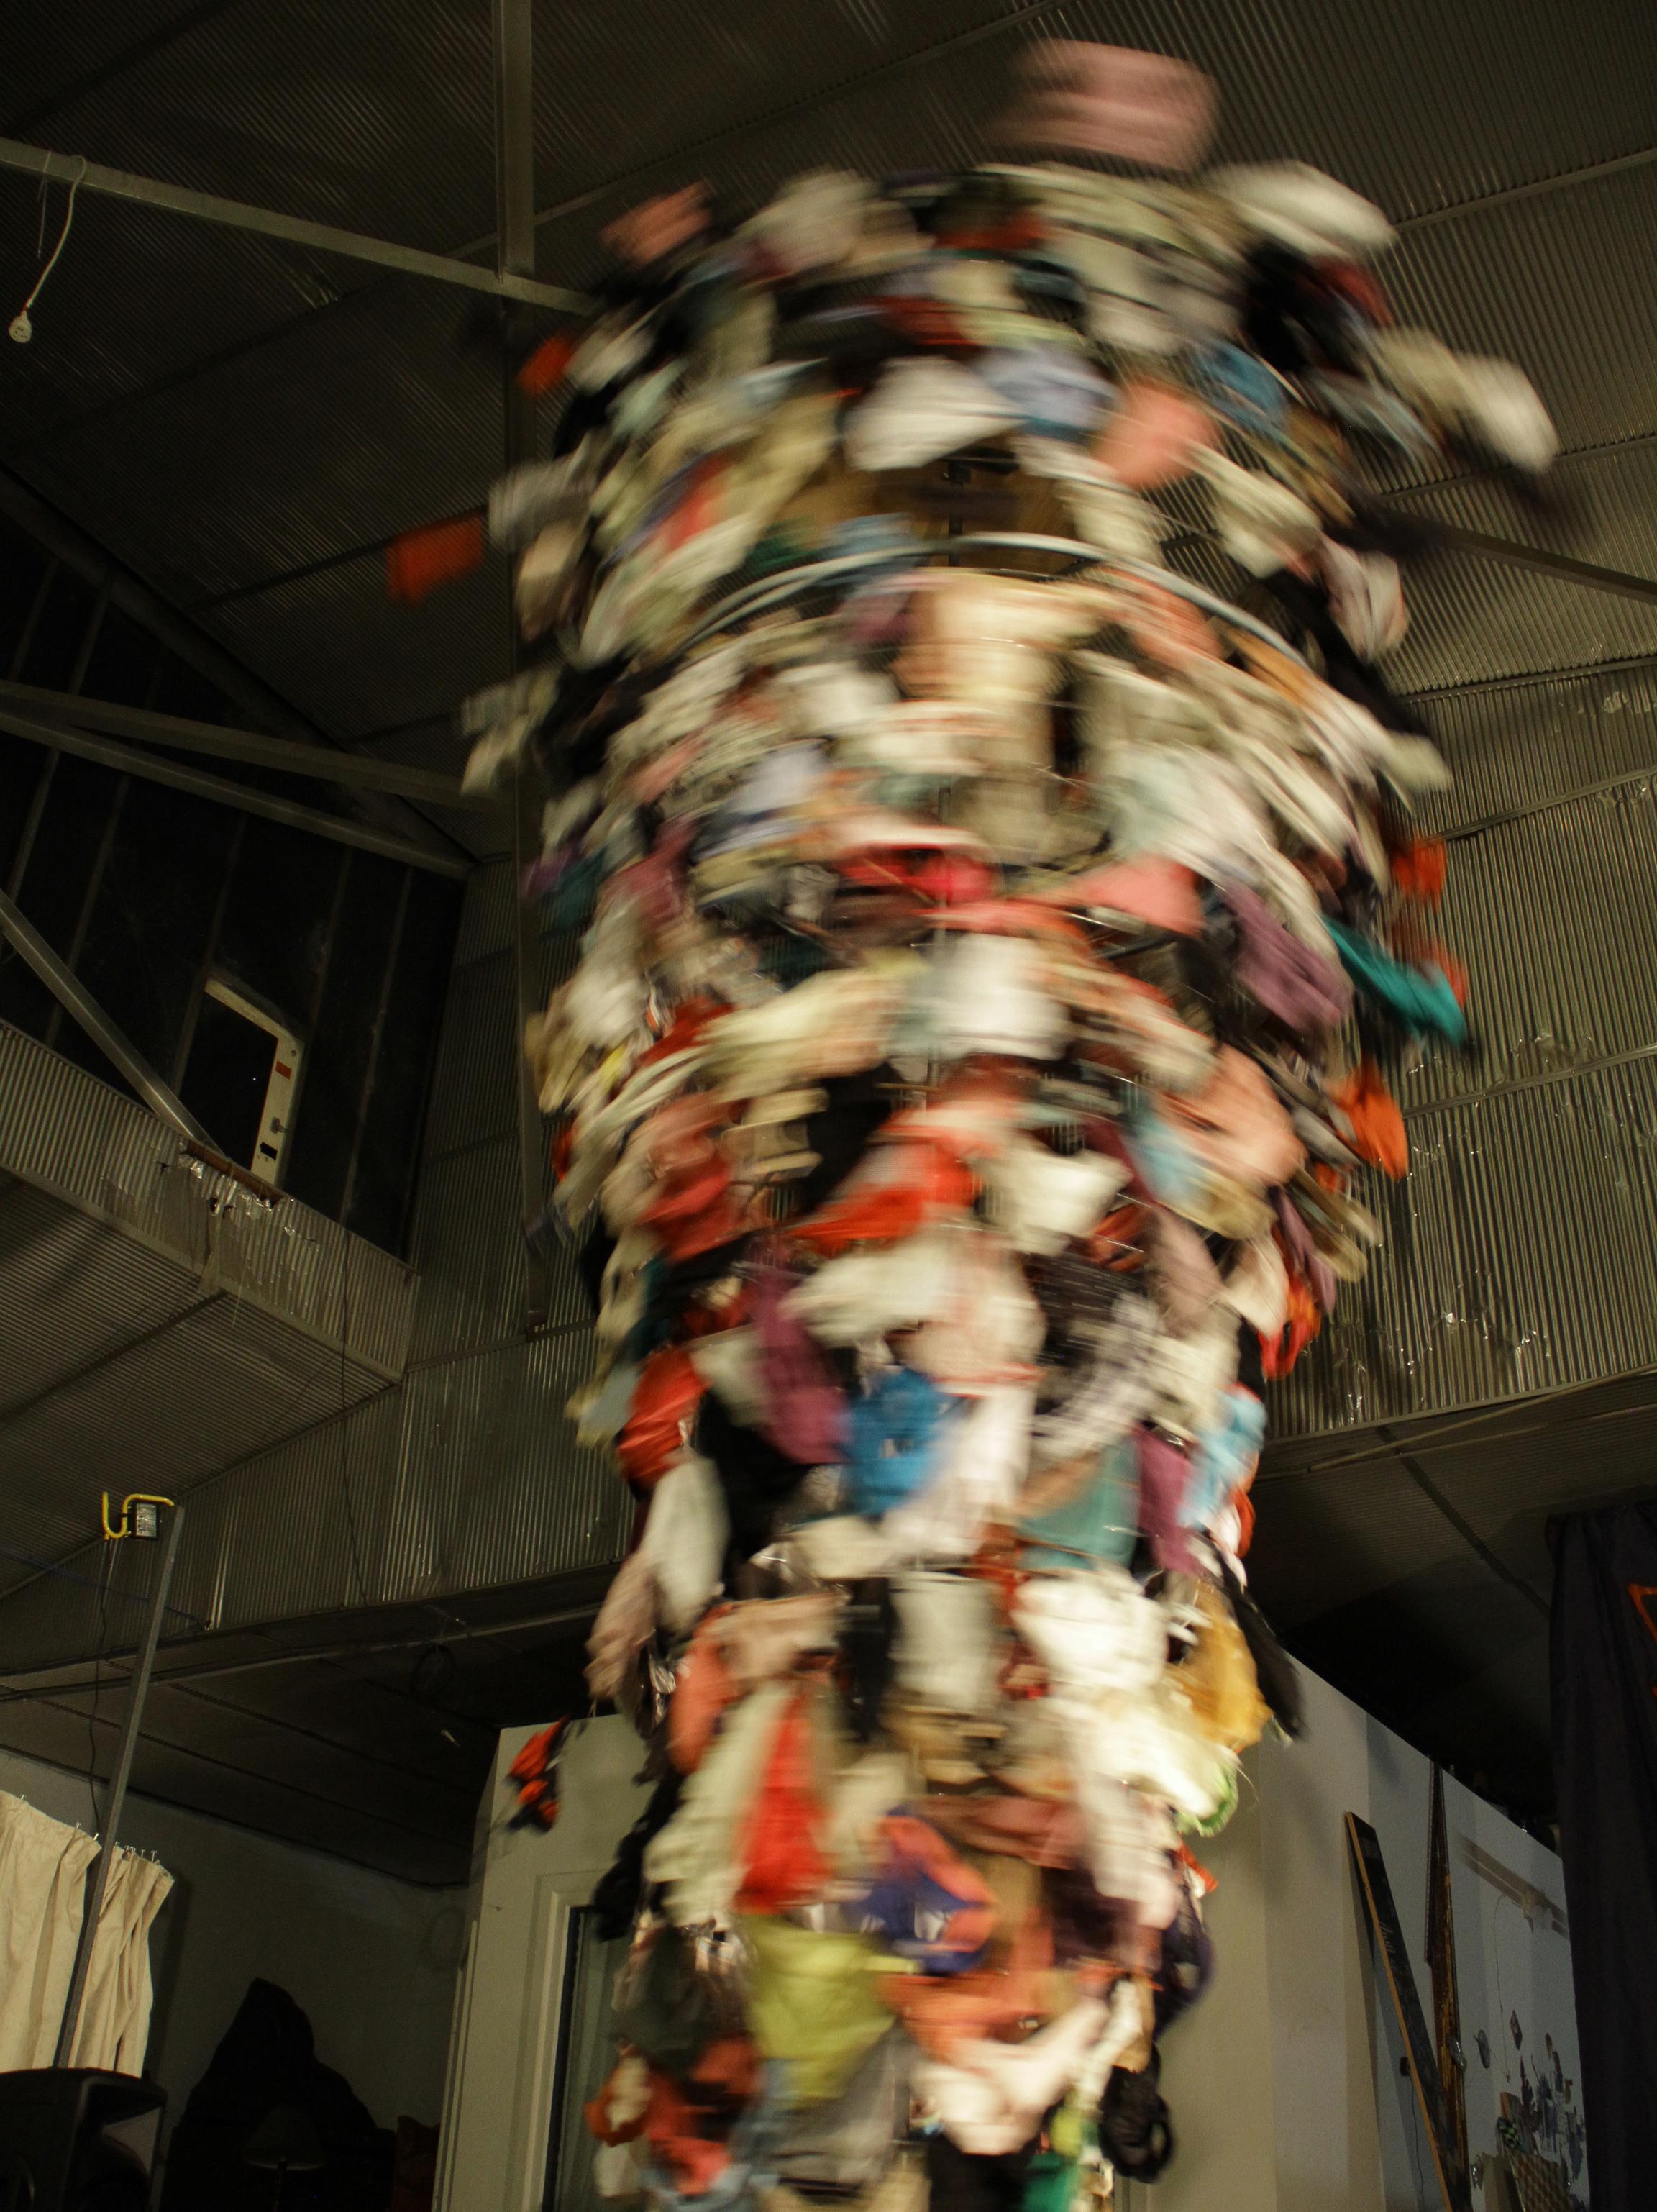 Dirty Panties Tornado  Used panties, metal, bamboo, plastic tubing, wire, motor, smoke machine and strobe light | 16 X 5.5 feet | 2011